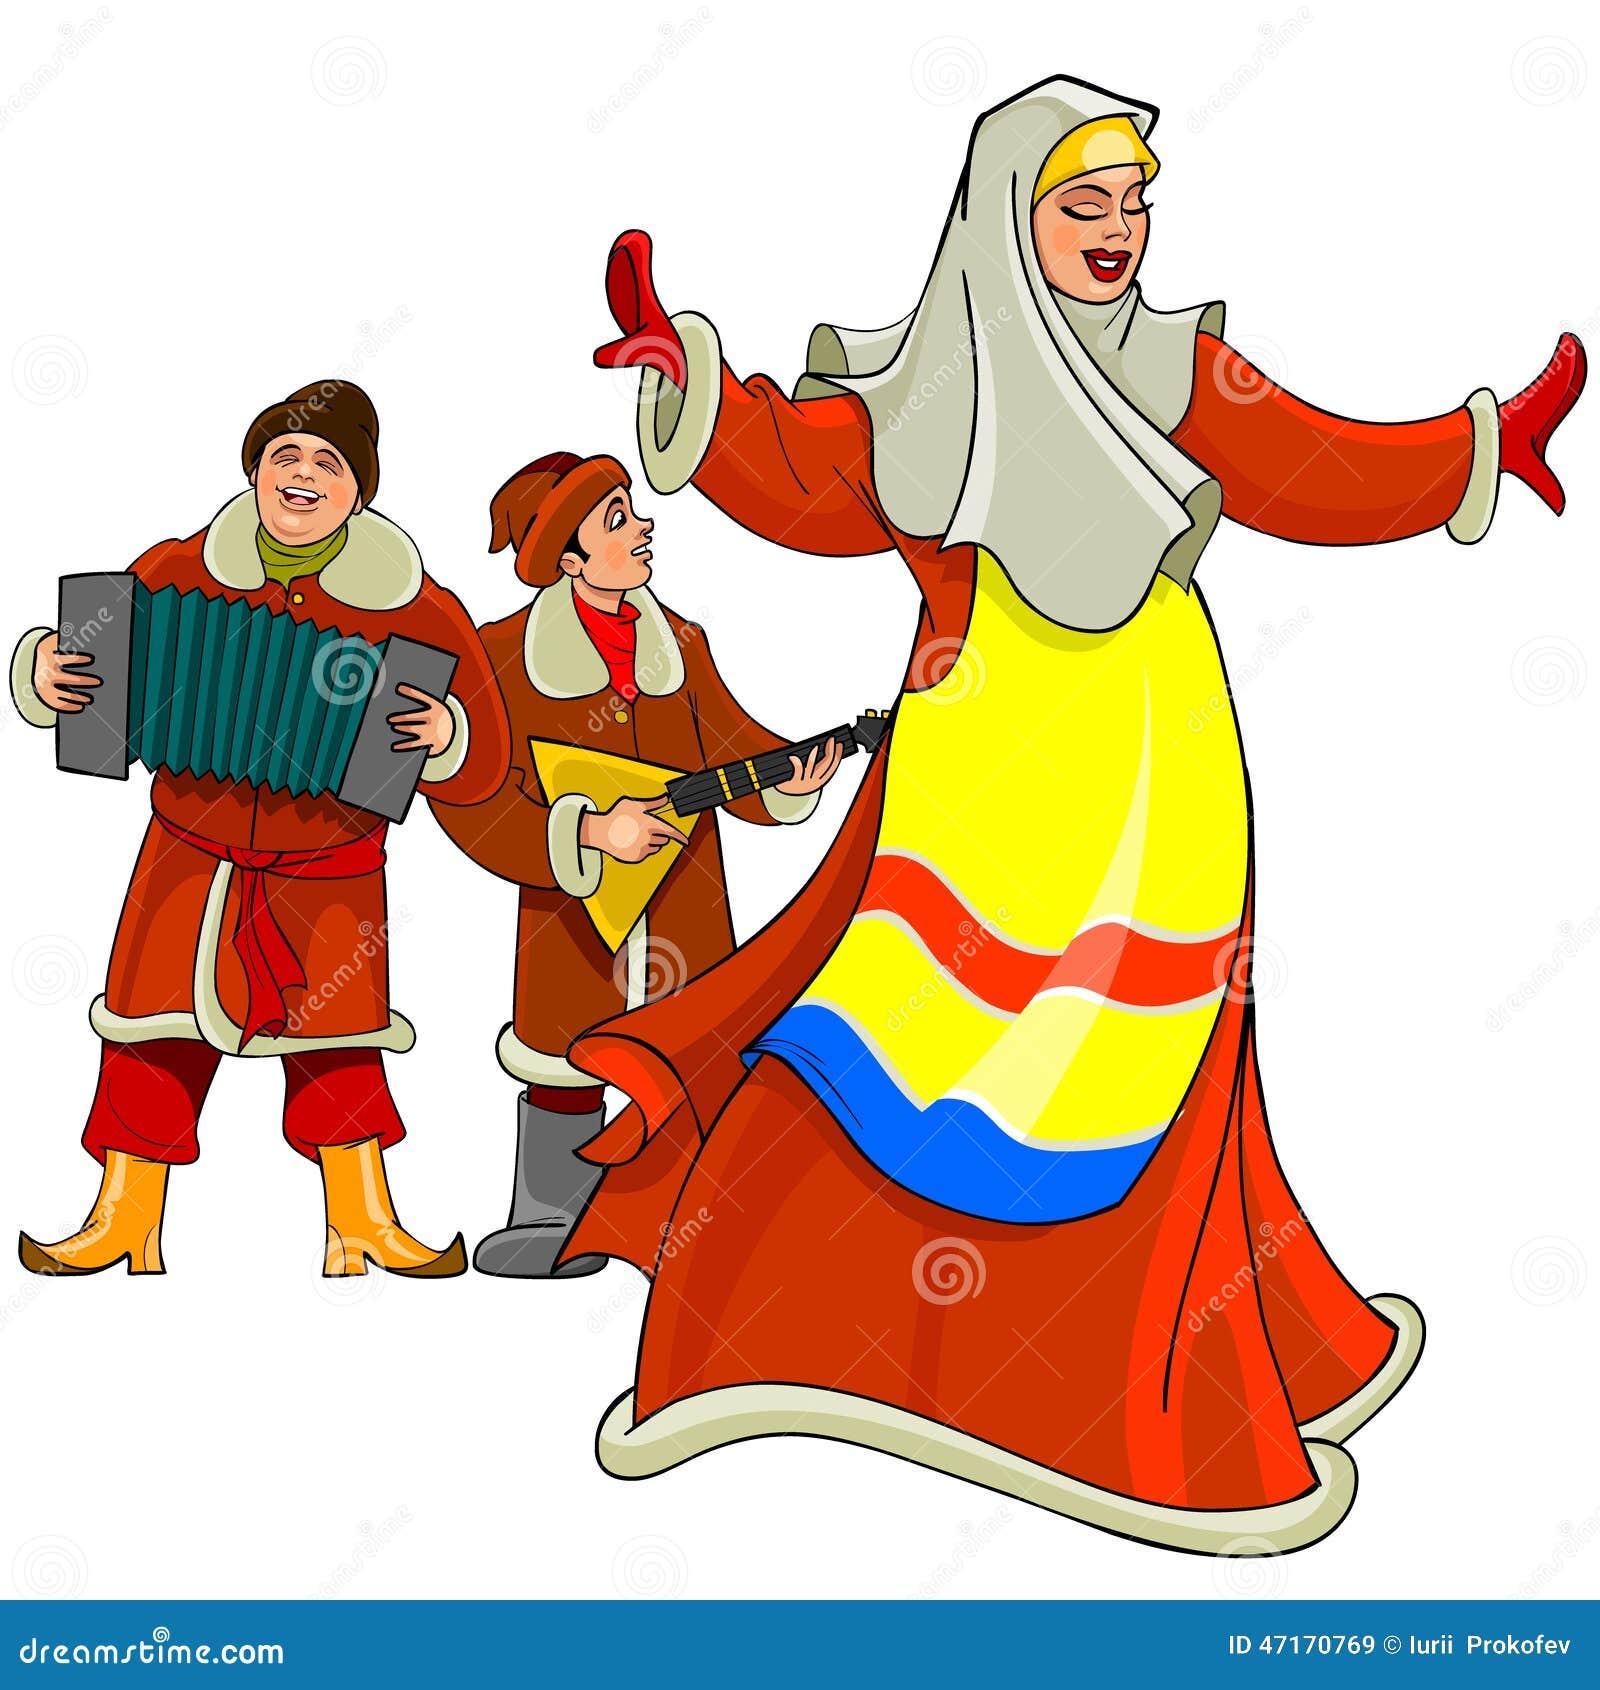 In the Russian national dress dancing woman, men play the accordion and balalaika